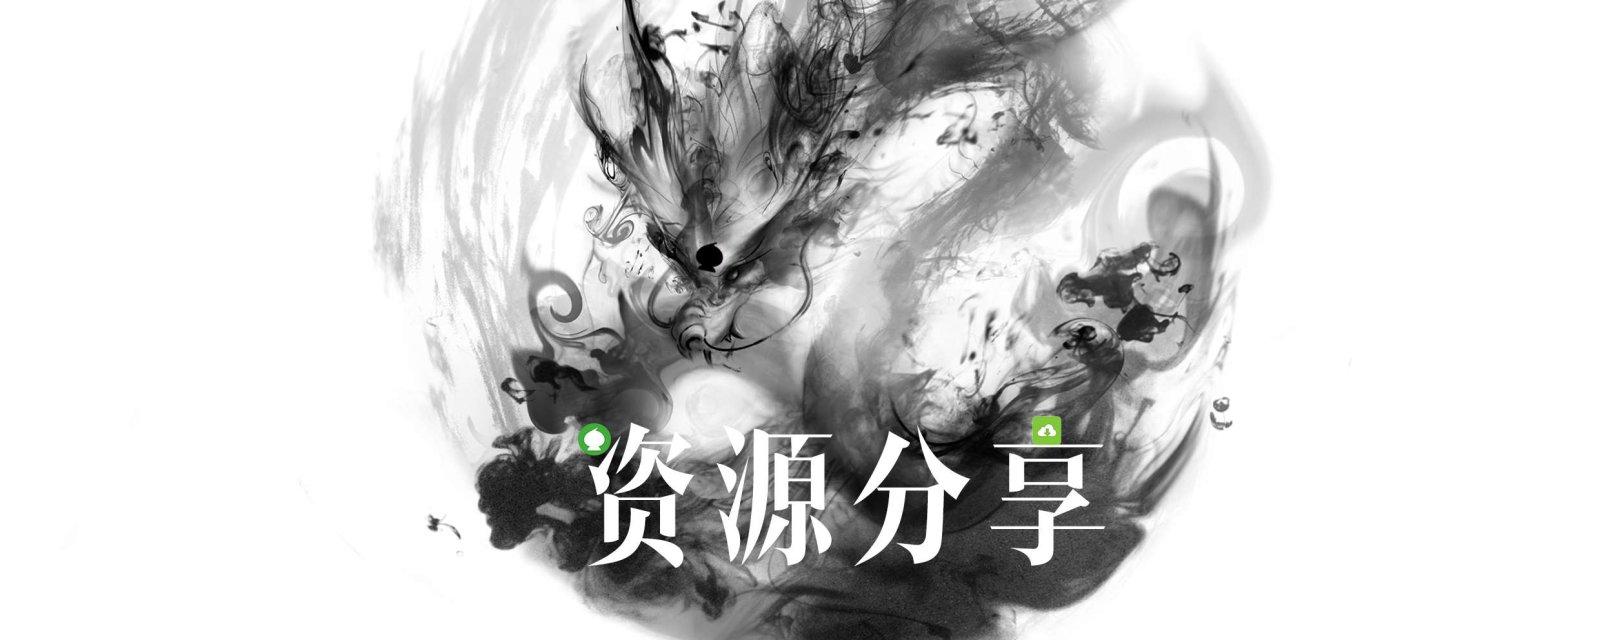 【PC】FL studio20安装及汉化